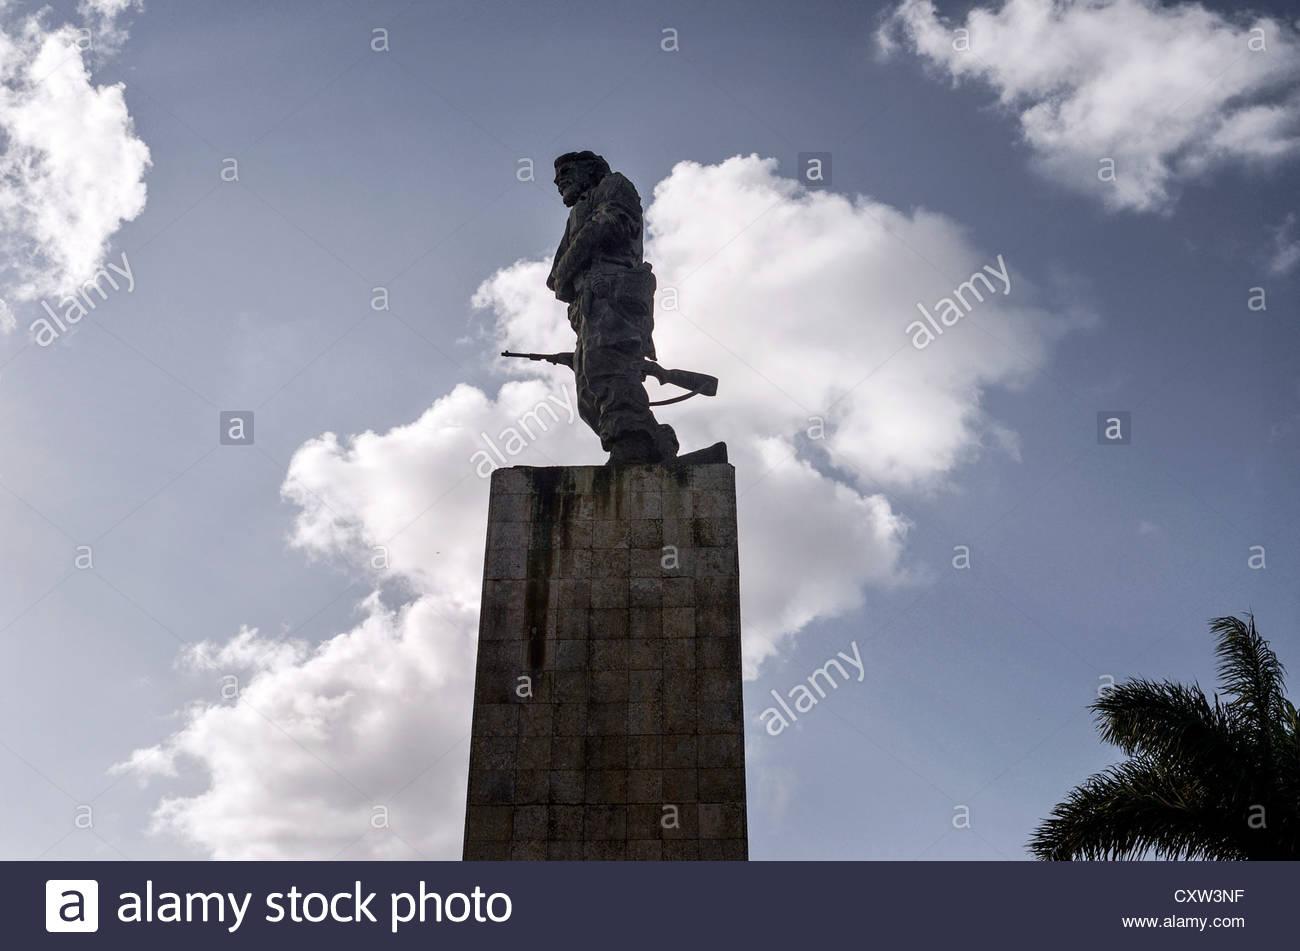 Statue von Che Guevara an der Che Guevara Mausoleum, Santa Clara, Kuba Stockbild